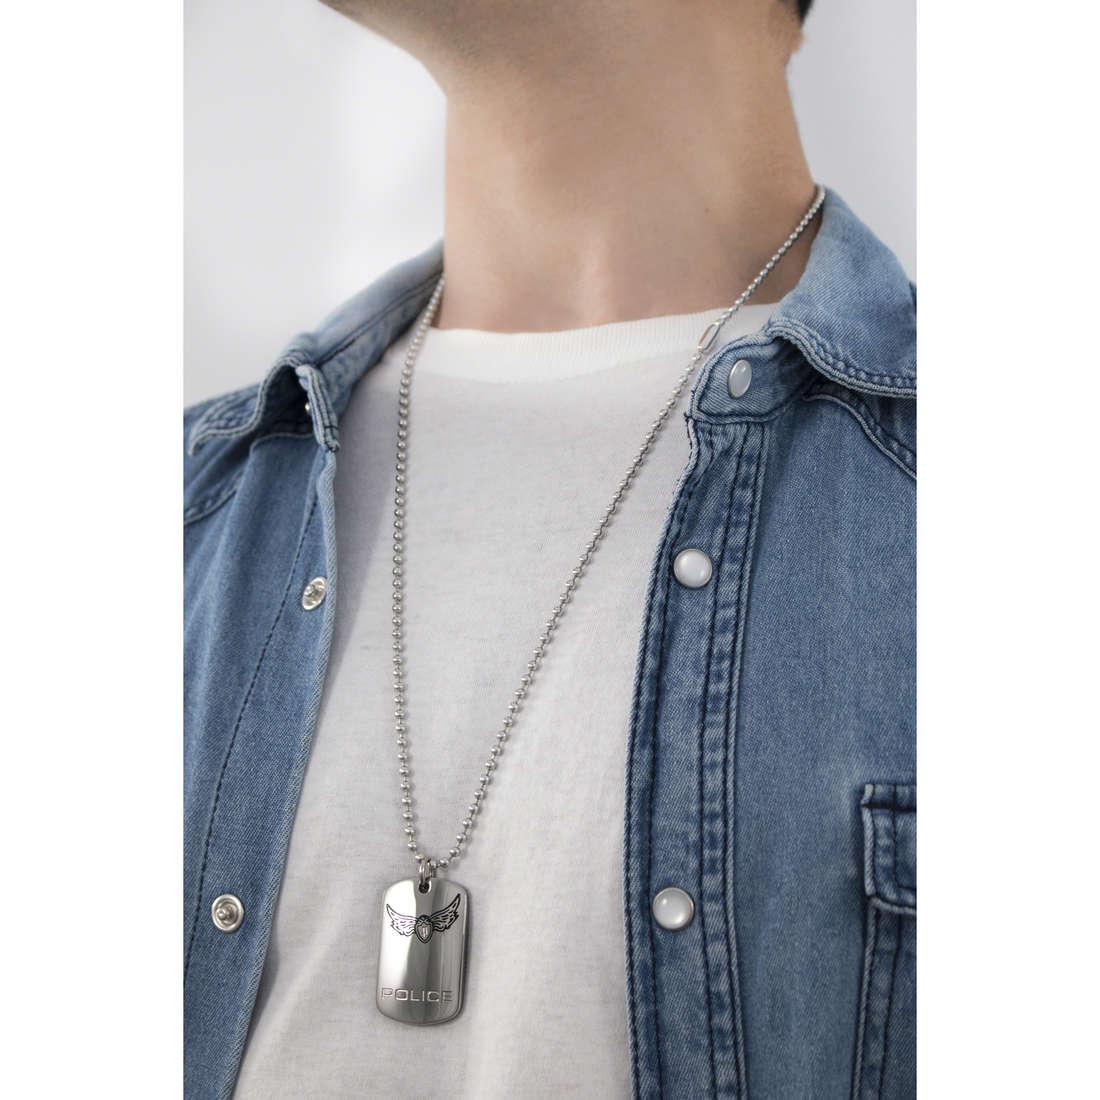 Police necklaces Icarus man S14IY01P indosso